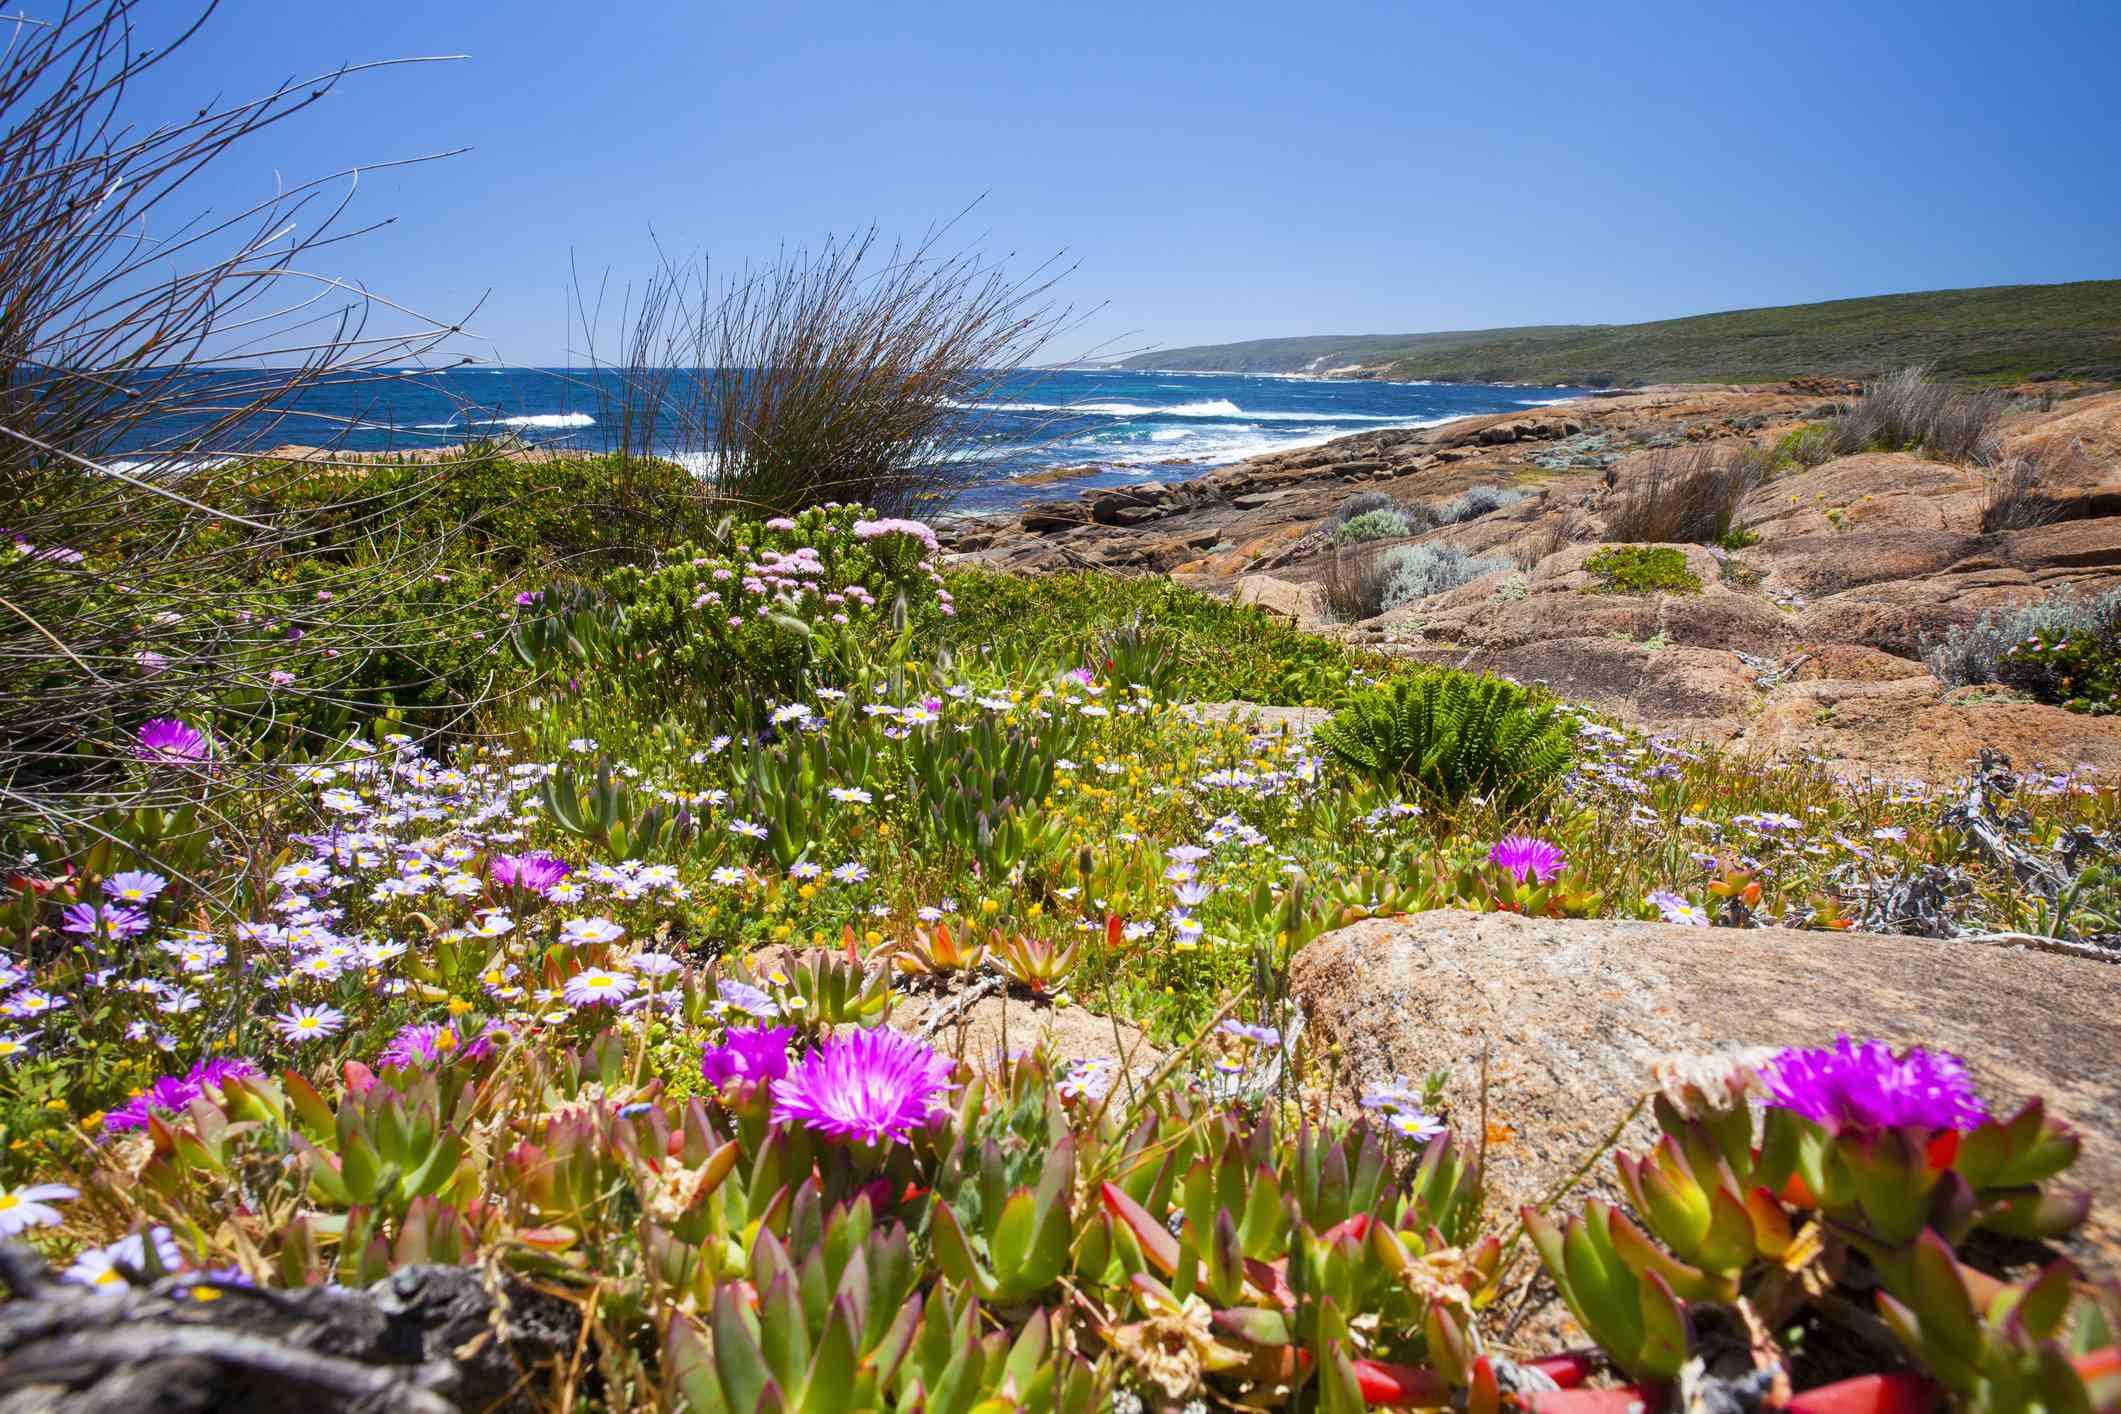 Wildflowers along coast of Cape Naturaliste, Western Australia